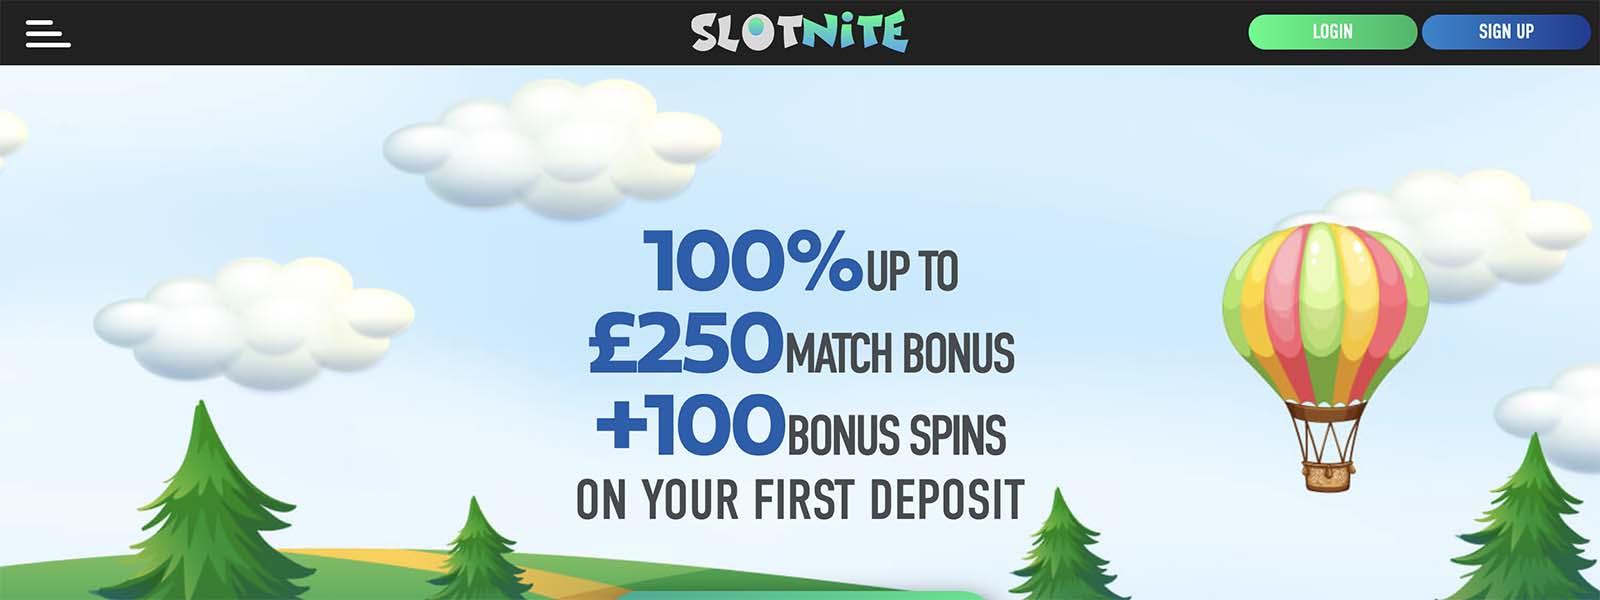 slotnite casino welcome bonus